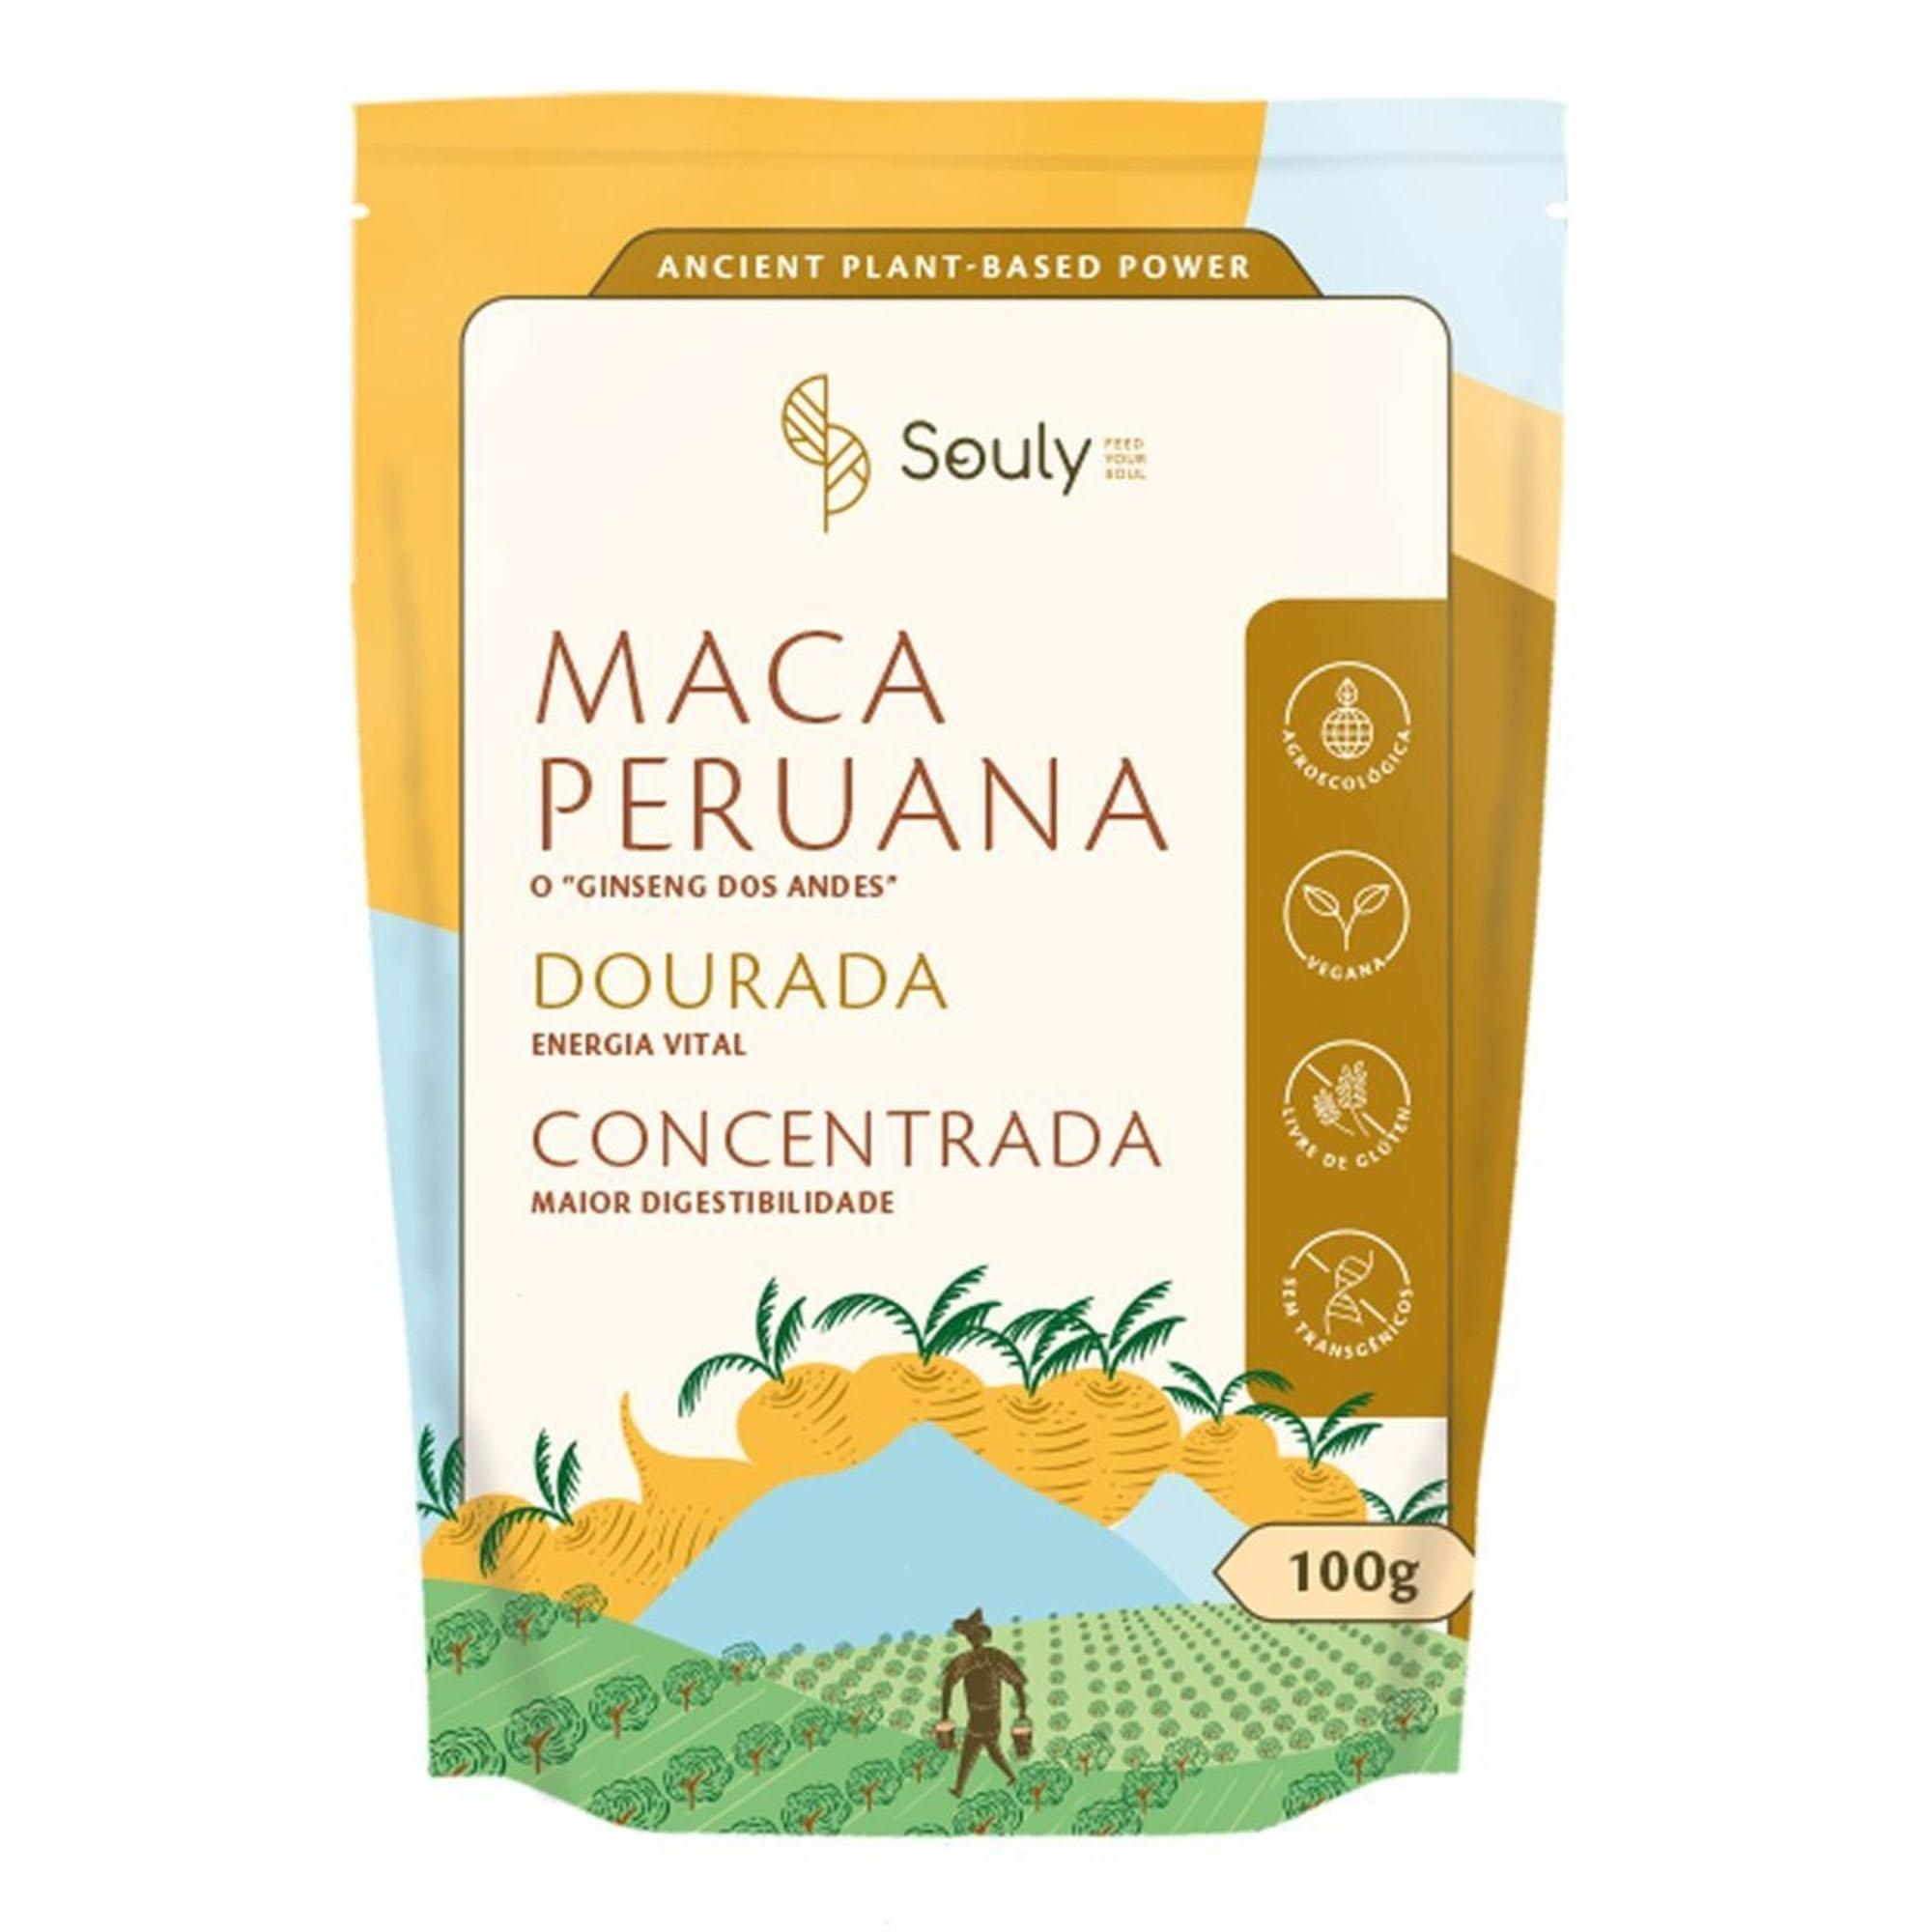 Maca Peruana Dourada - Souly